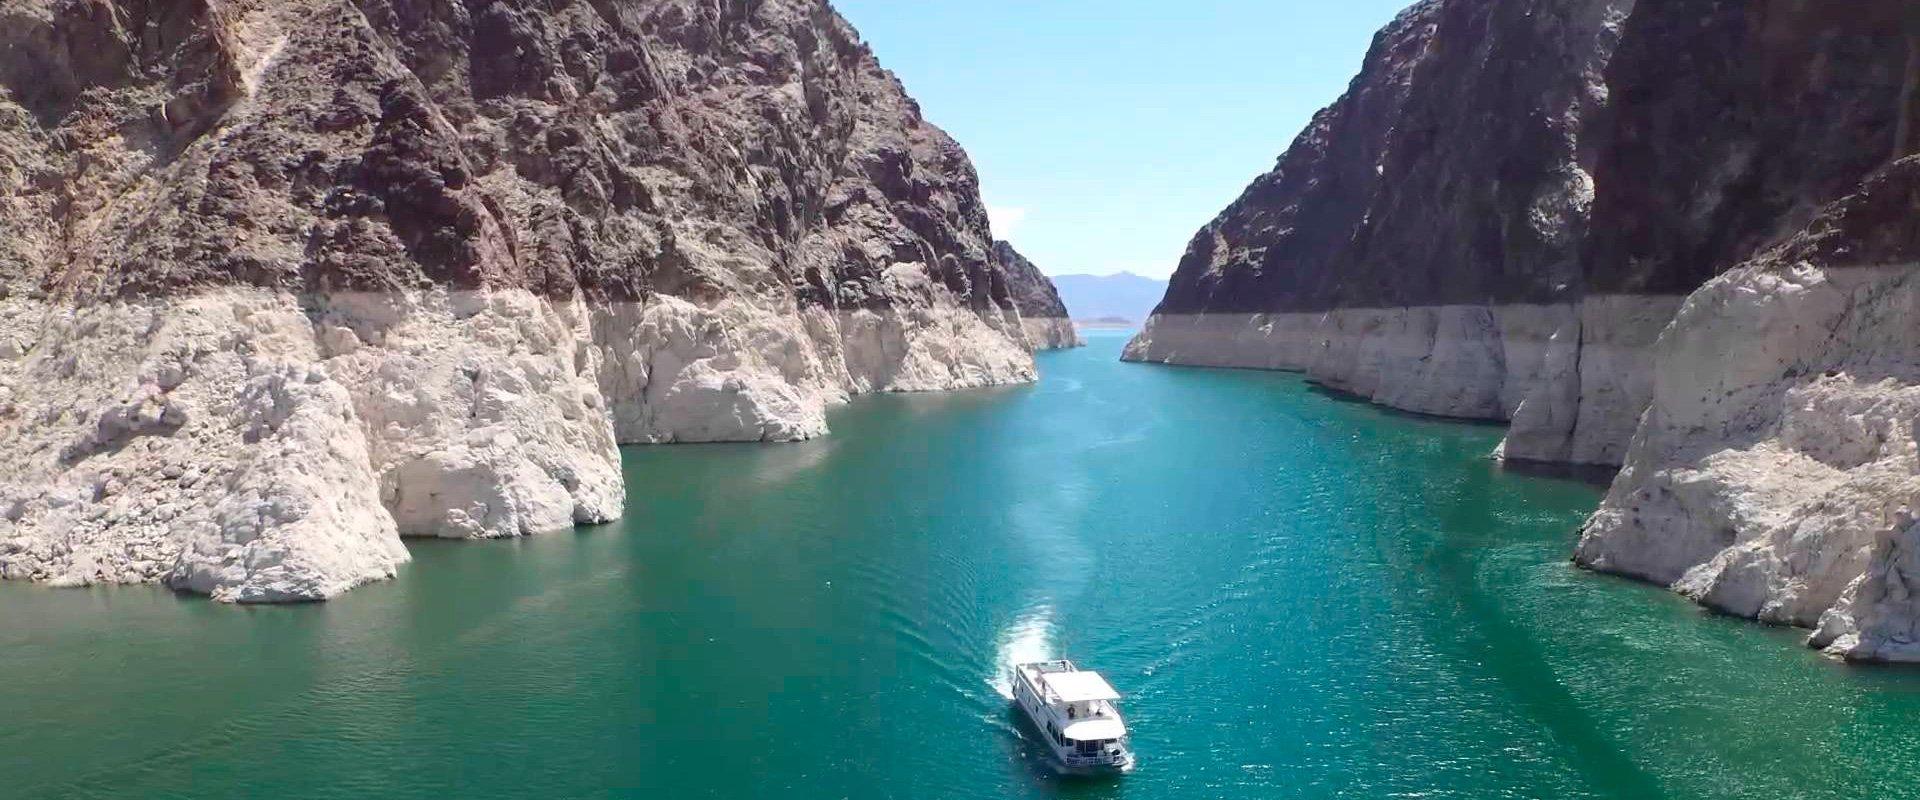 Экскурсия по озеру МИД с купанием